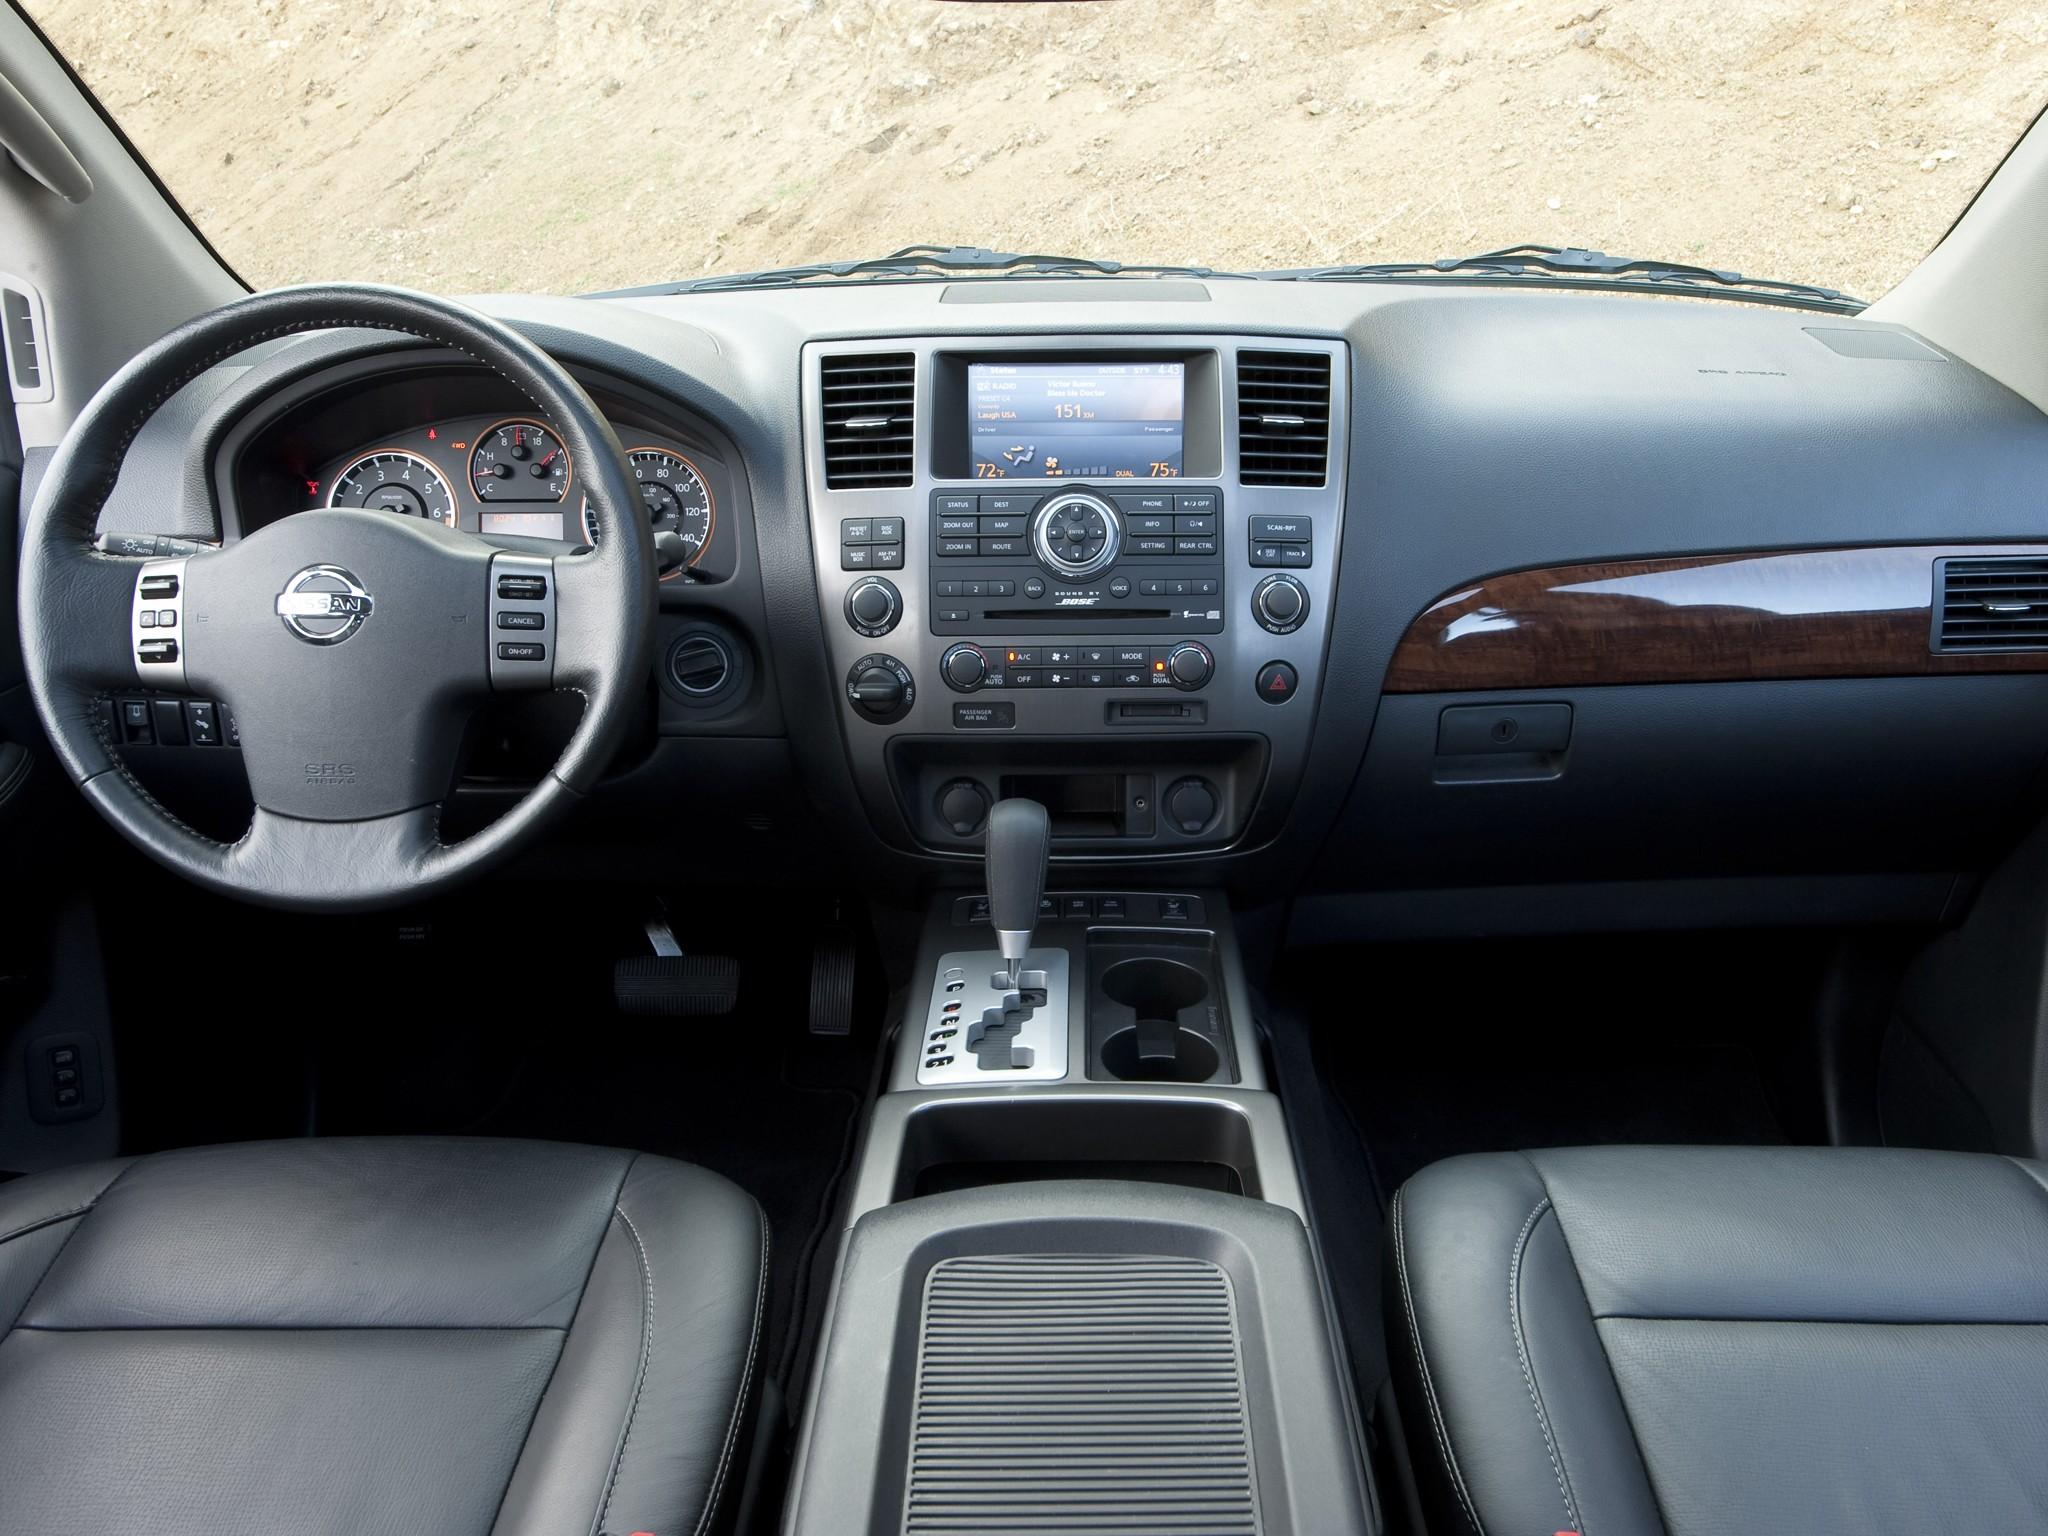 2006 Nissan Armada Interior Dimensions